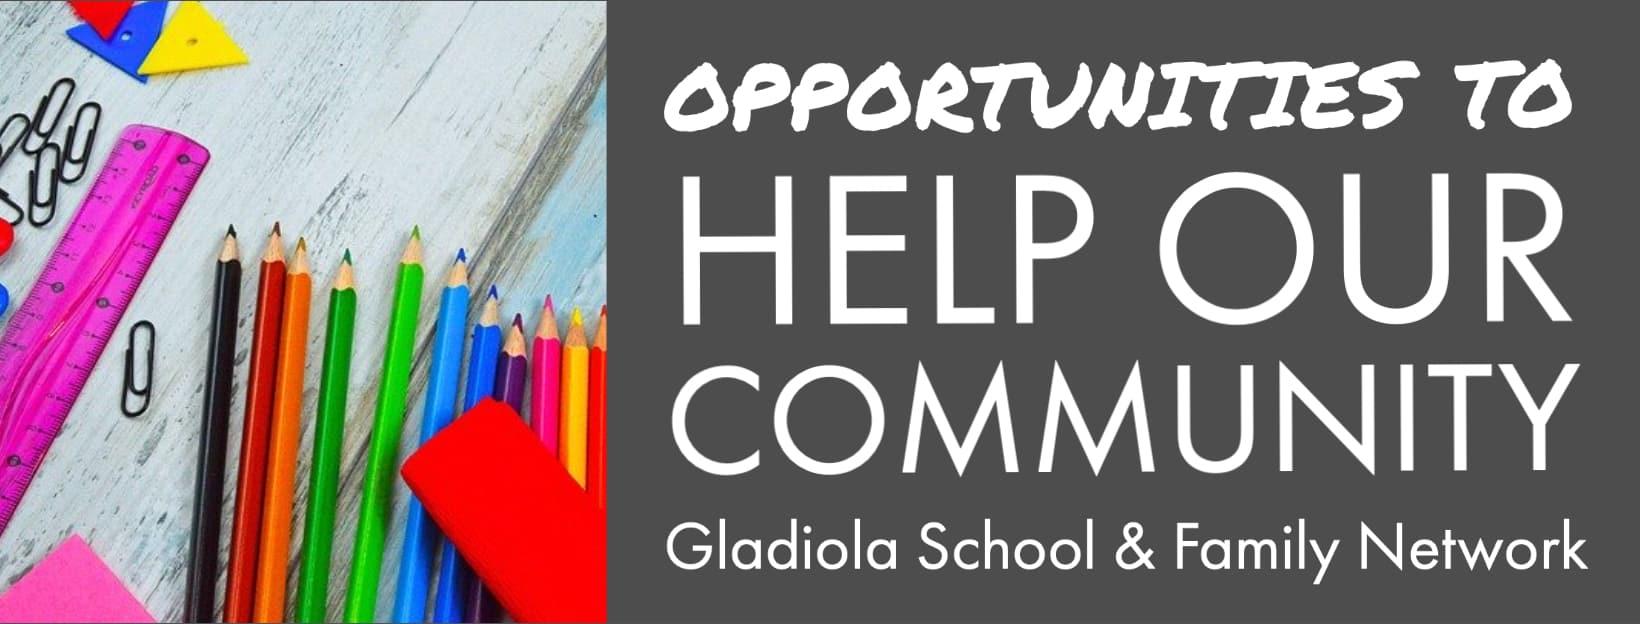 Gladiola School Supplies_Header Image